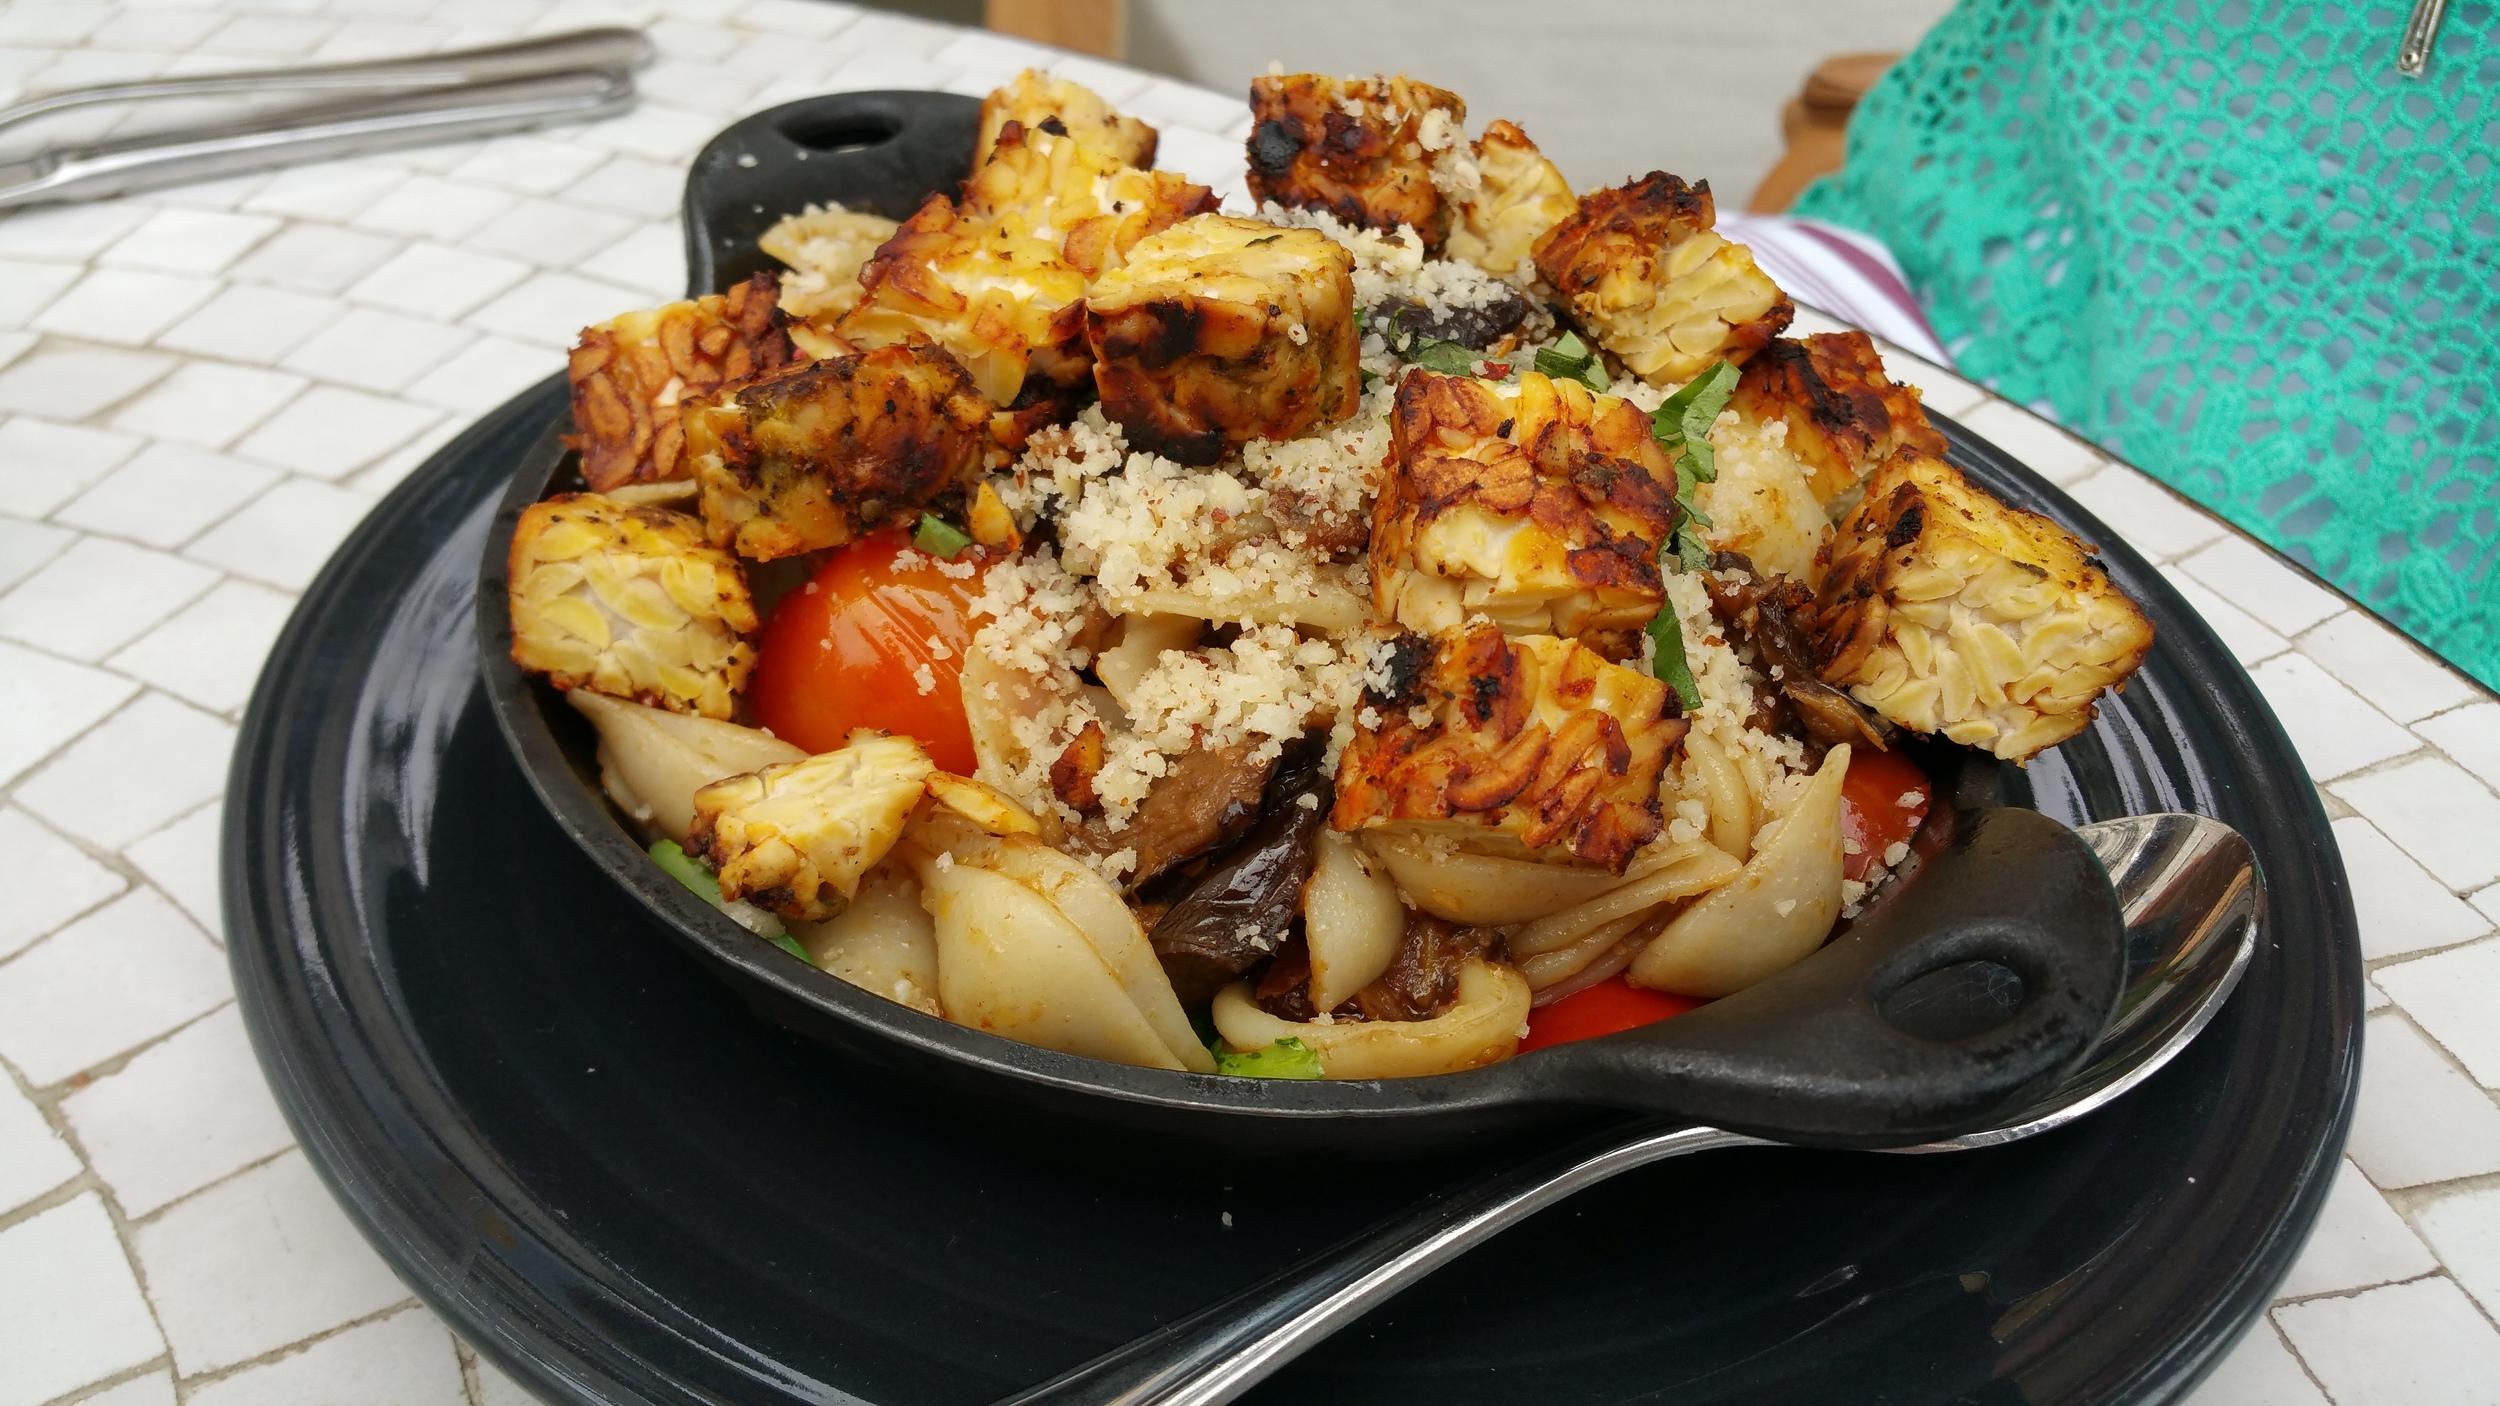 I Am Bountiful: Quinoa Pasta, Cherry Tomatoes, Eggplant, Fresh Basil with Charred Tempeh